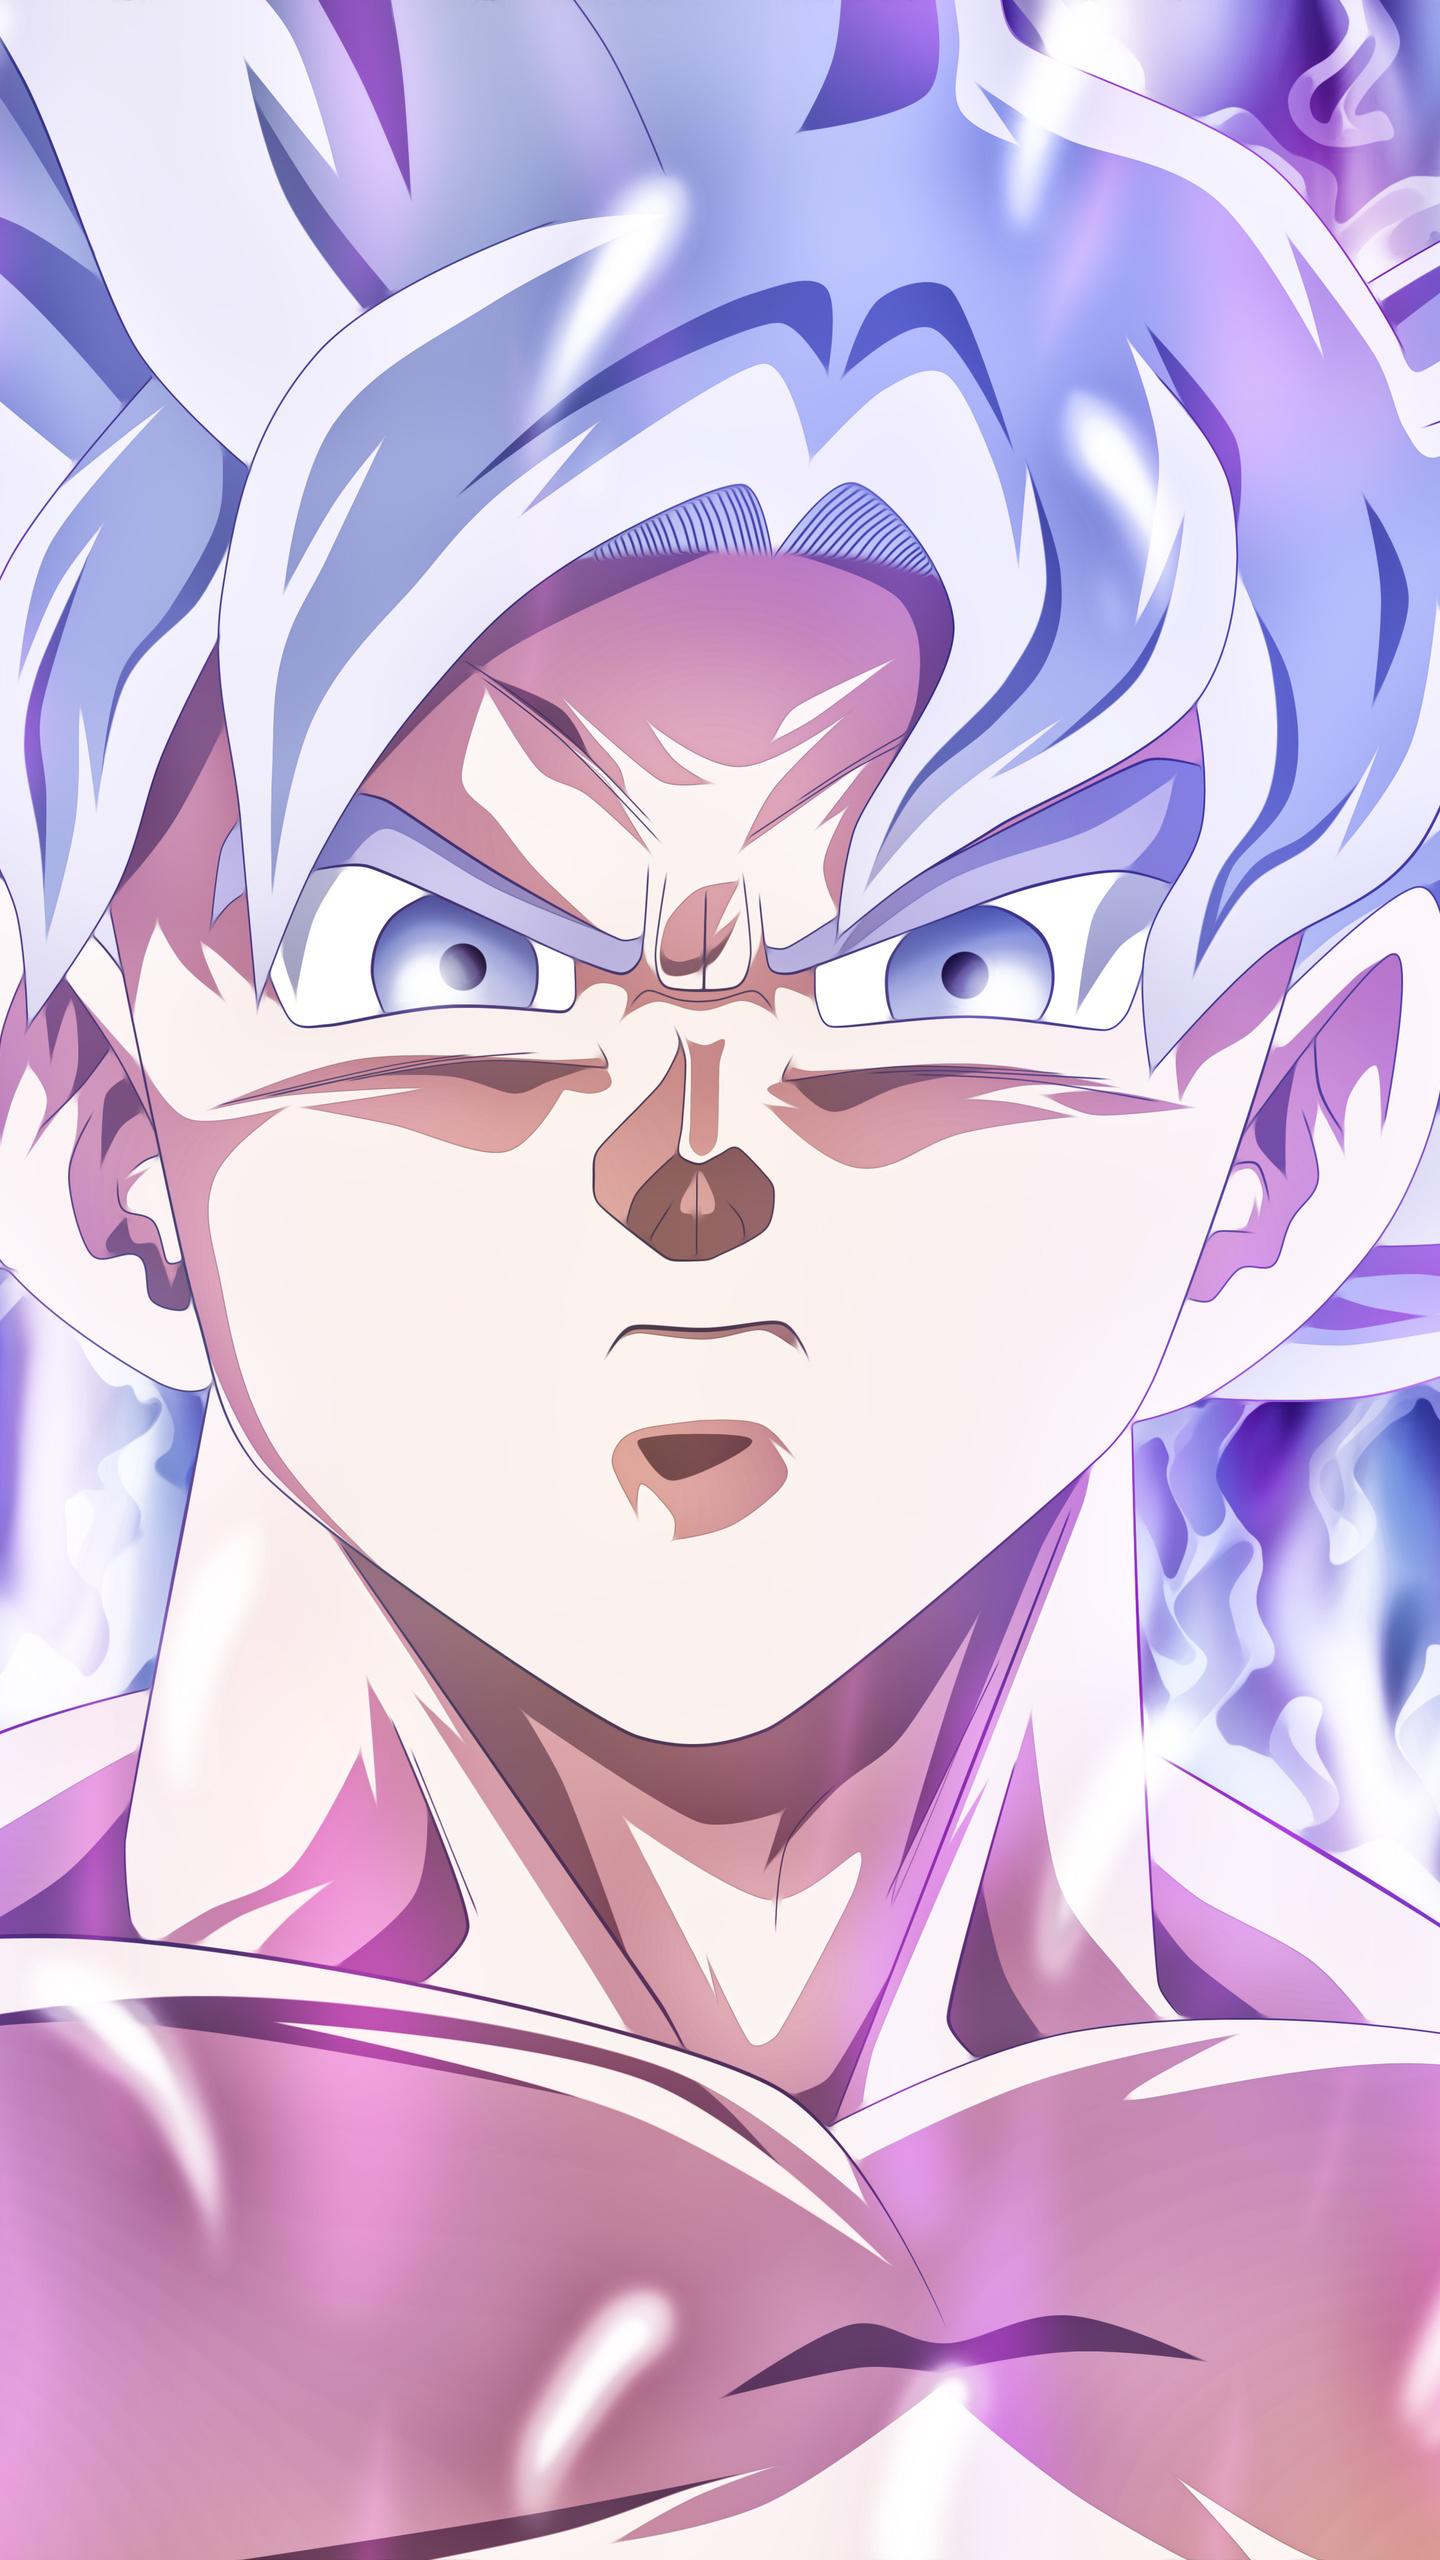 1440x2560 Goku Mastered Ultra Instinct Samsung Galaxy S6 ...